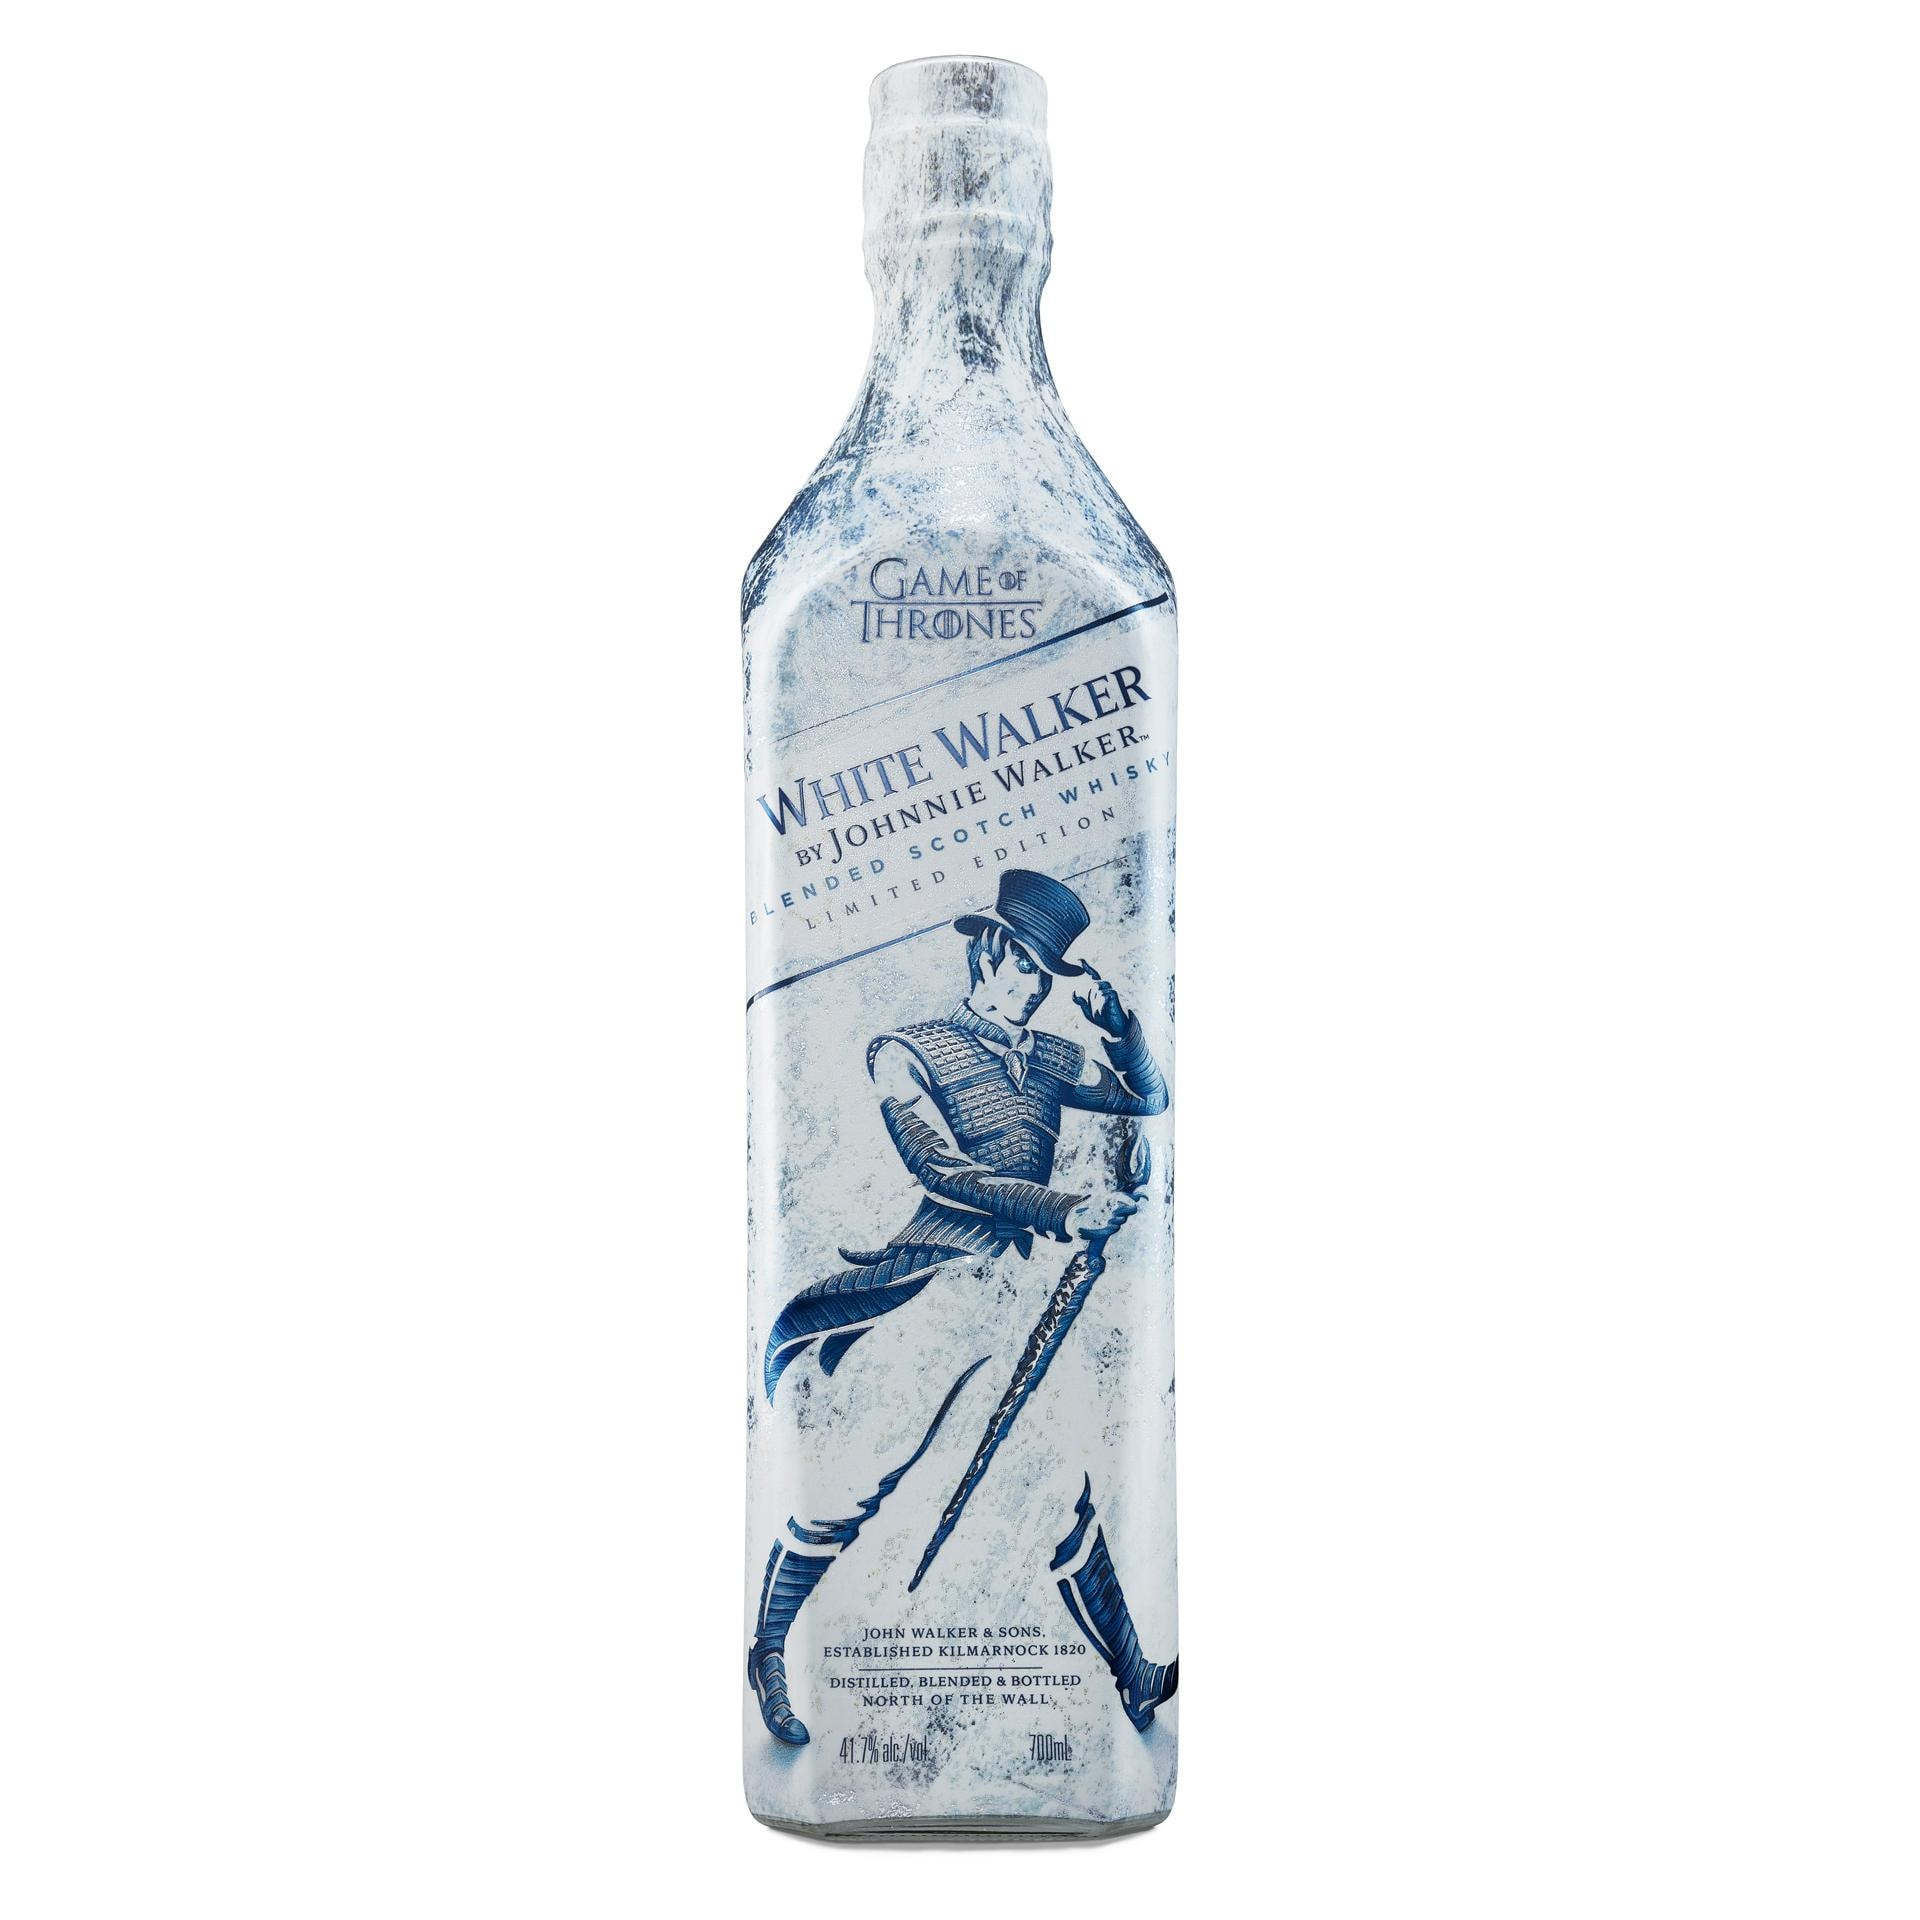 Johnnie Walker White Walker Blended Scotch Whisky 0,7l